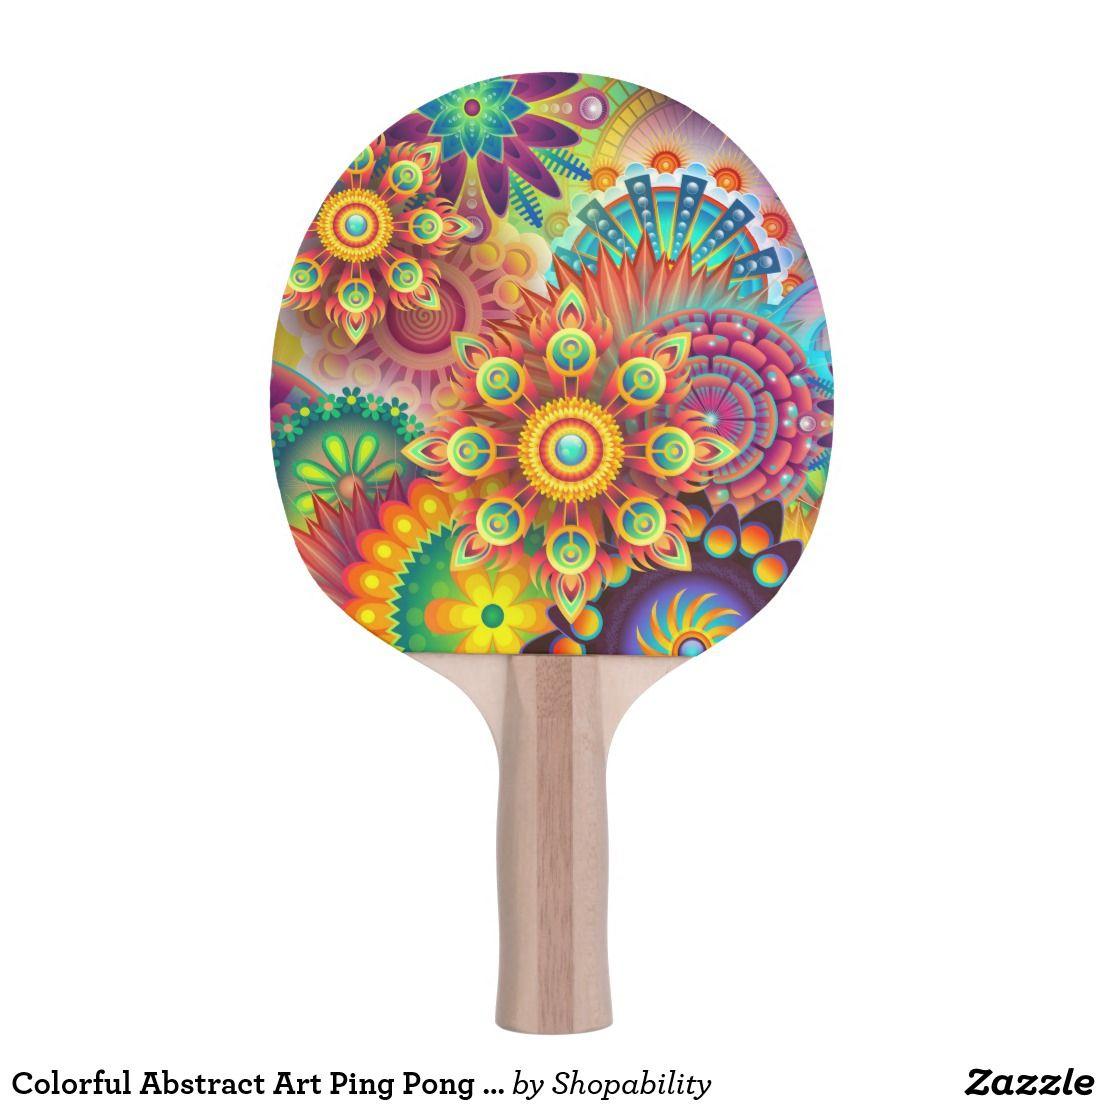 Colorful Abstract Art Ping Pong Paddle Smile Sparkle And Shine Ping Pong Paddles Ping Pong Paddle Black Re Ping Pong Paddles Colorful Abstract Art Ping Pong